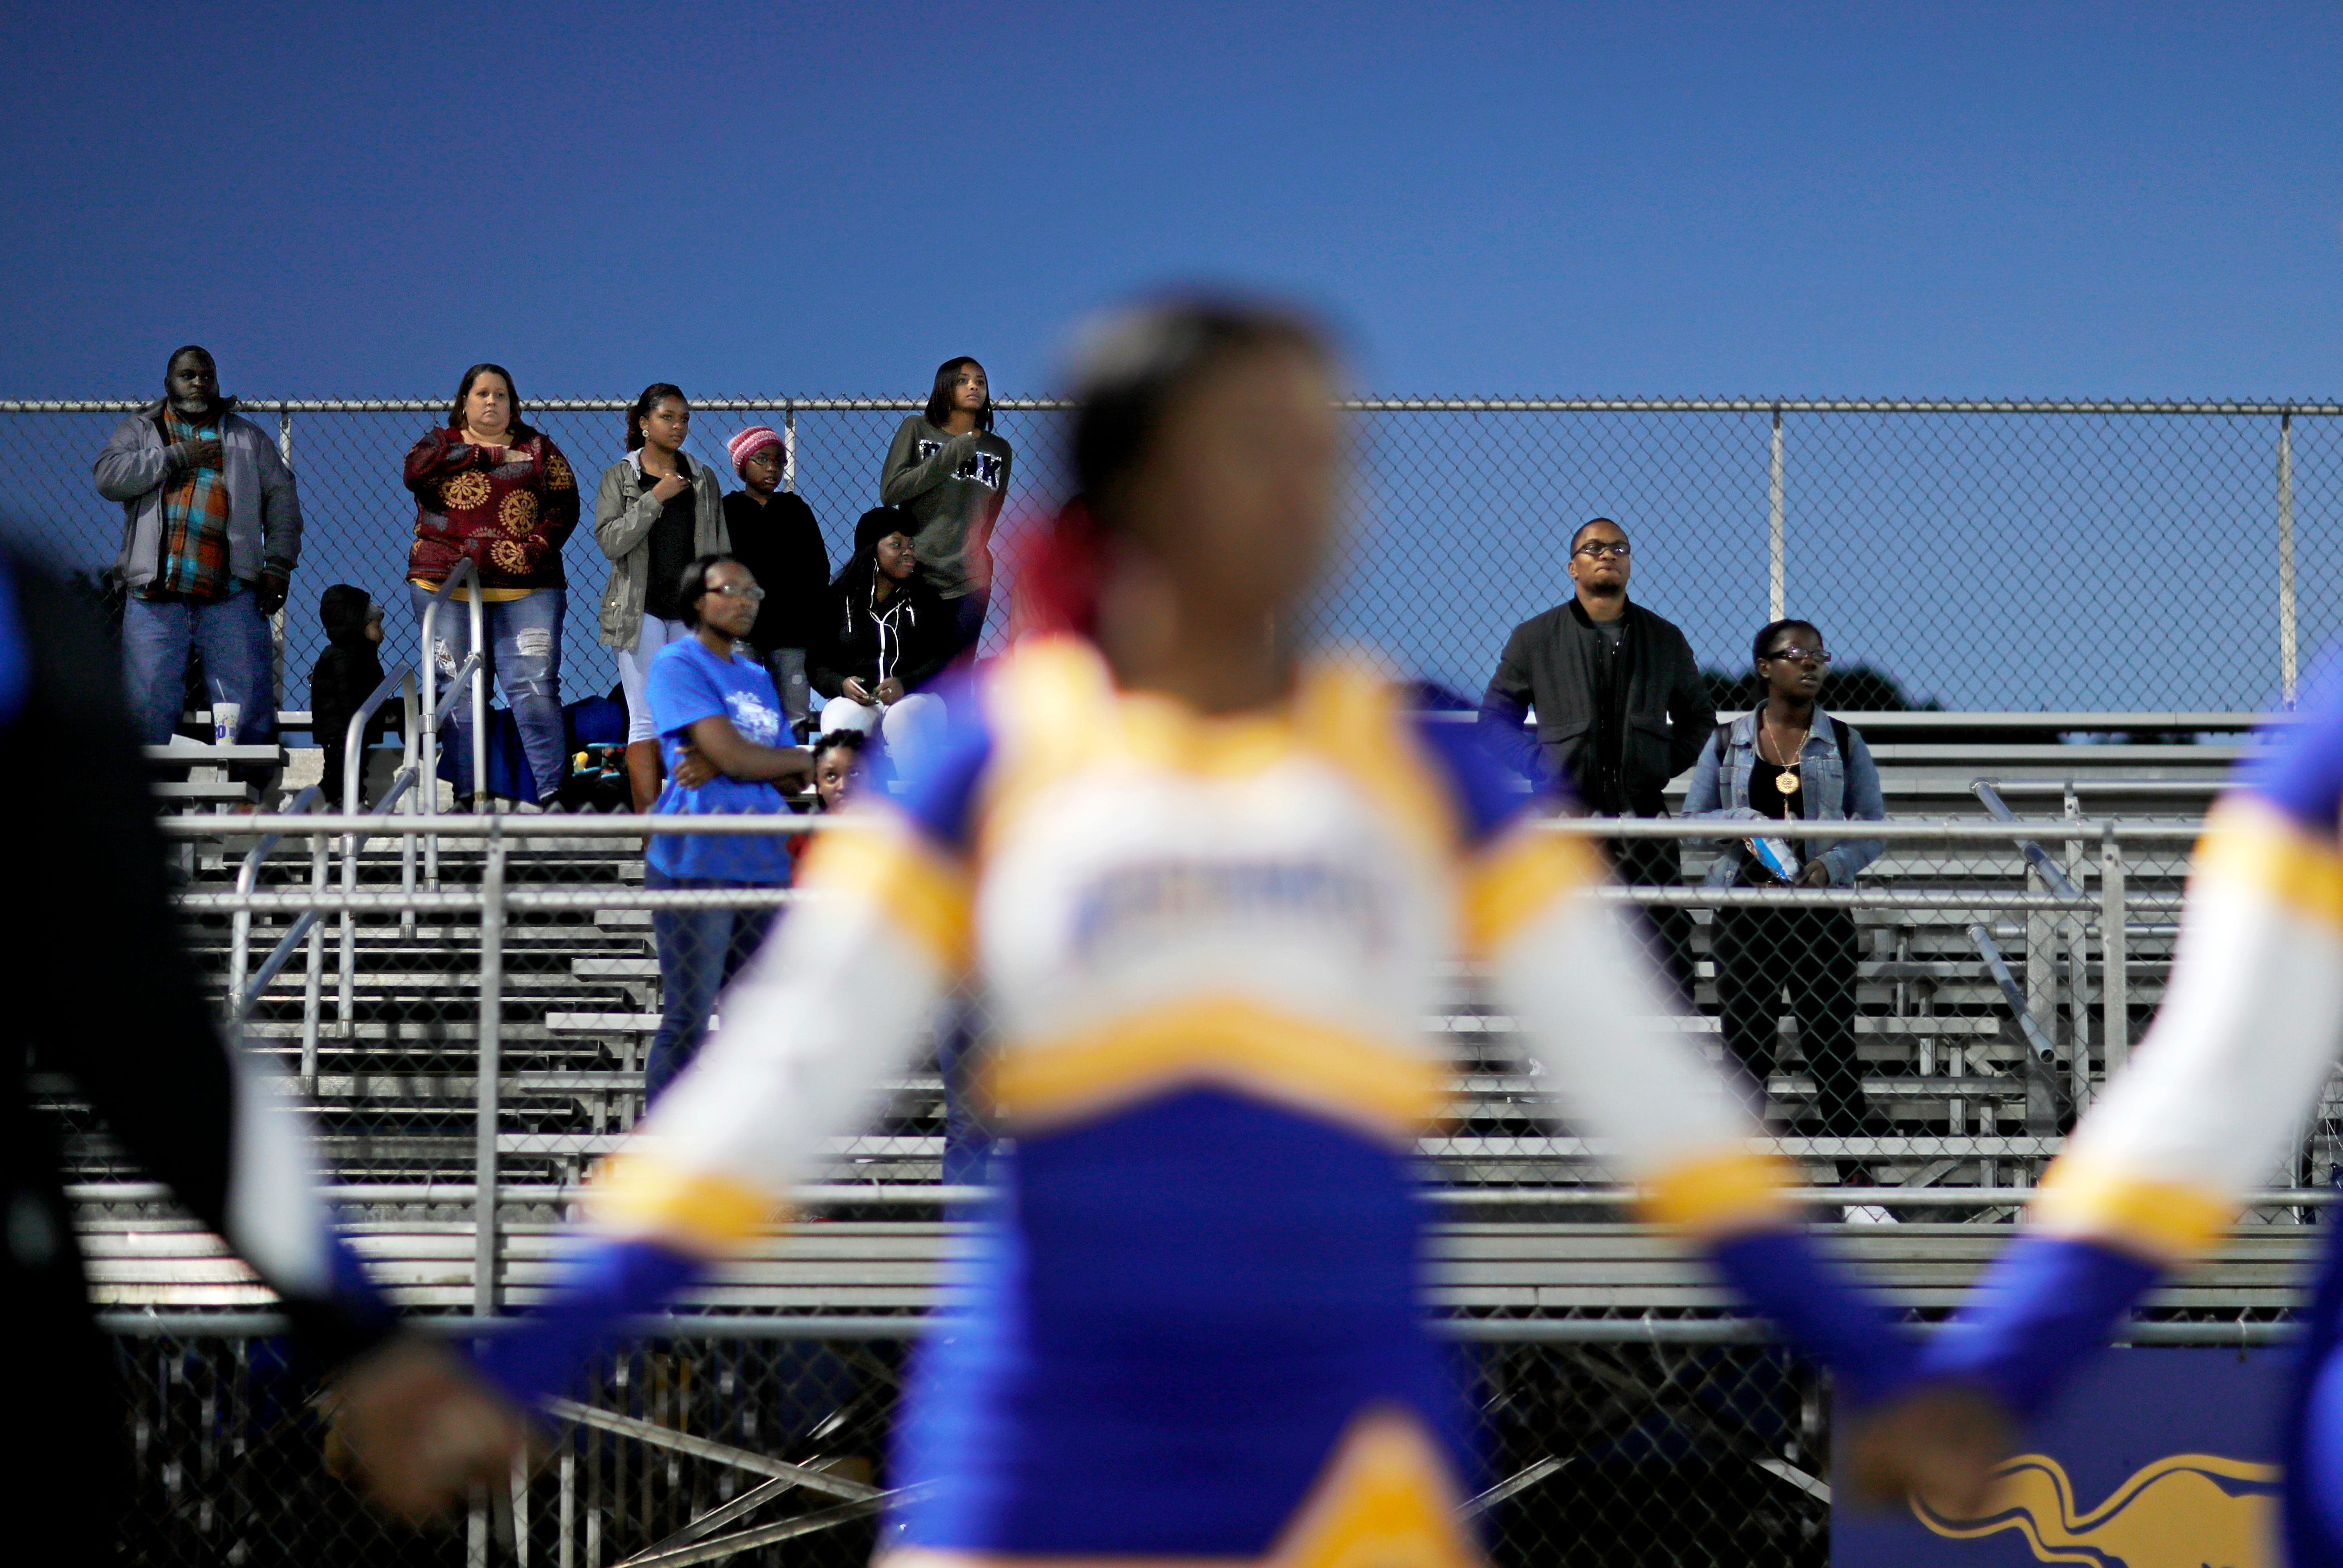 Cheerleader's mom accused of making 'deepfakes' of rivals 2